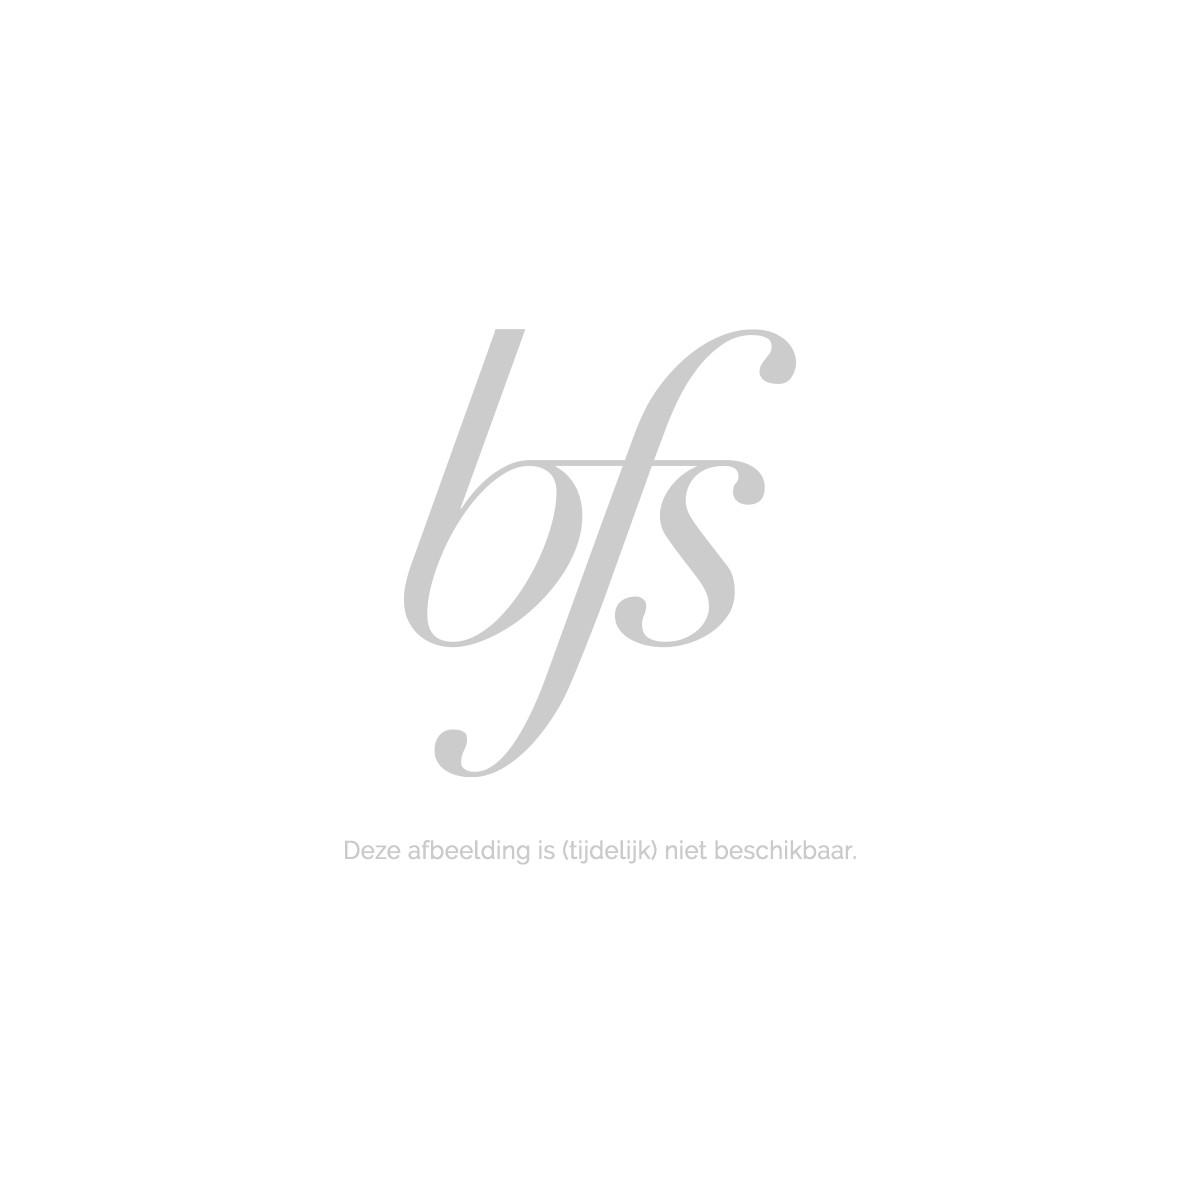 Max Factor Masterpiece Mascara 002 Black/Brown